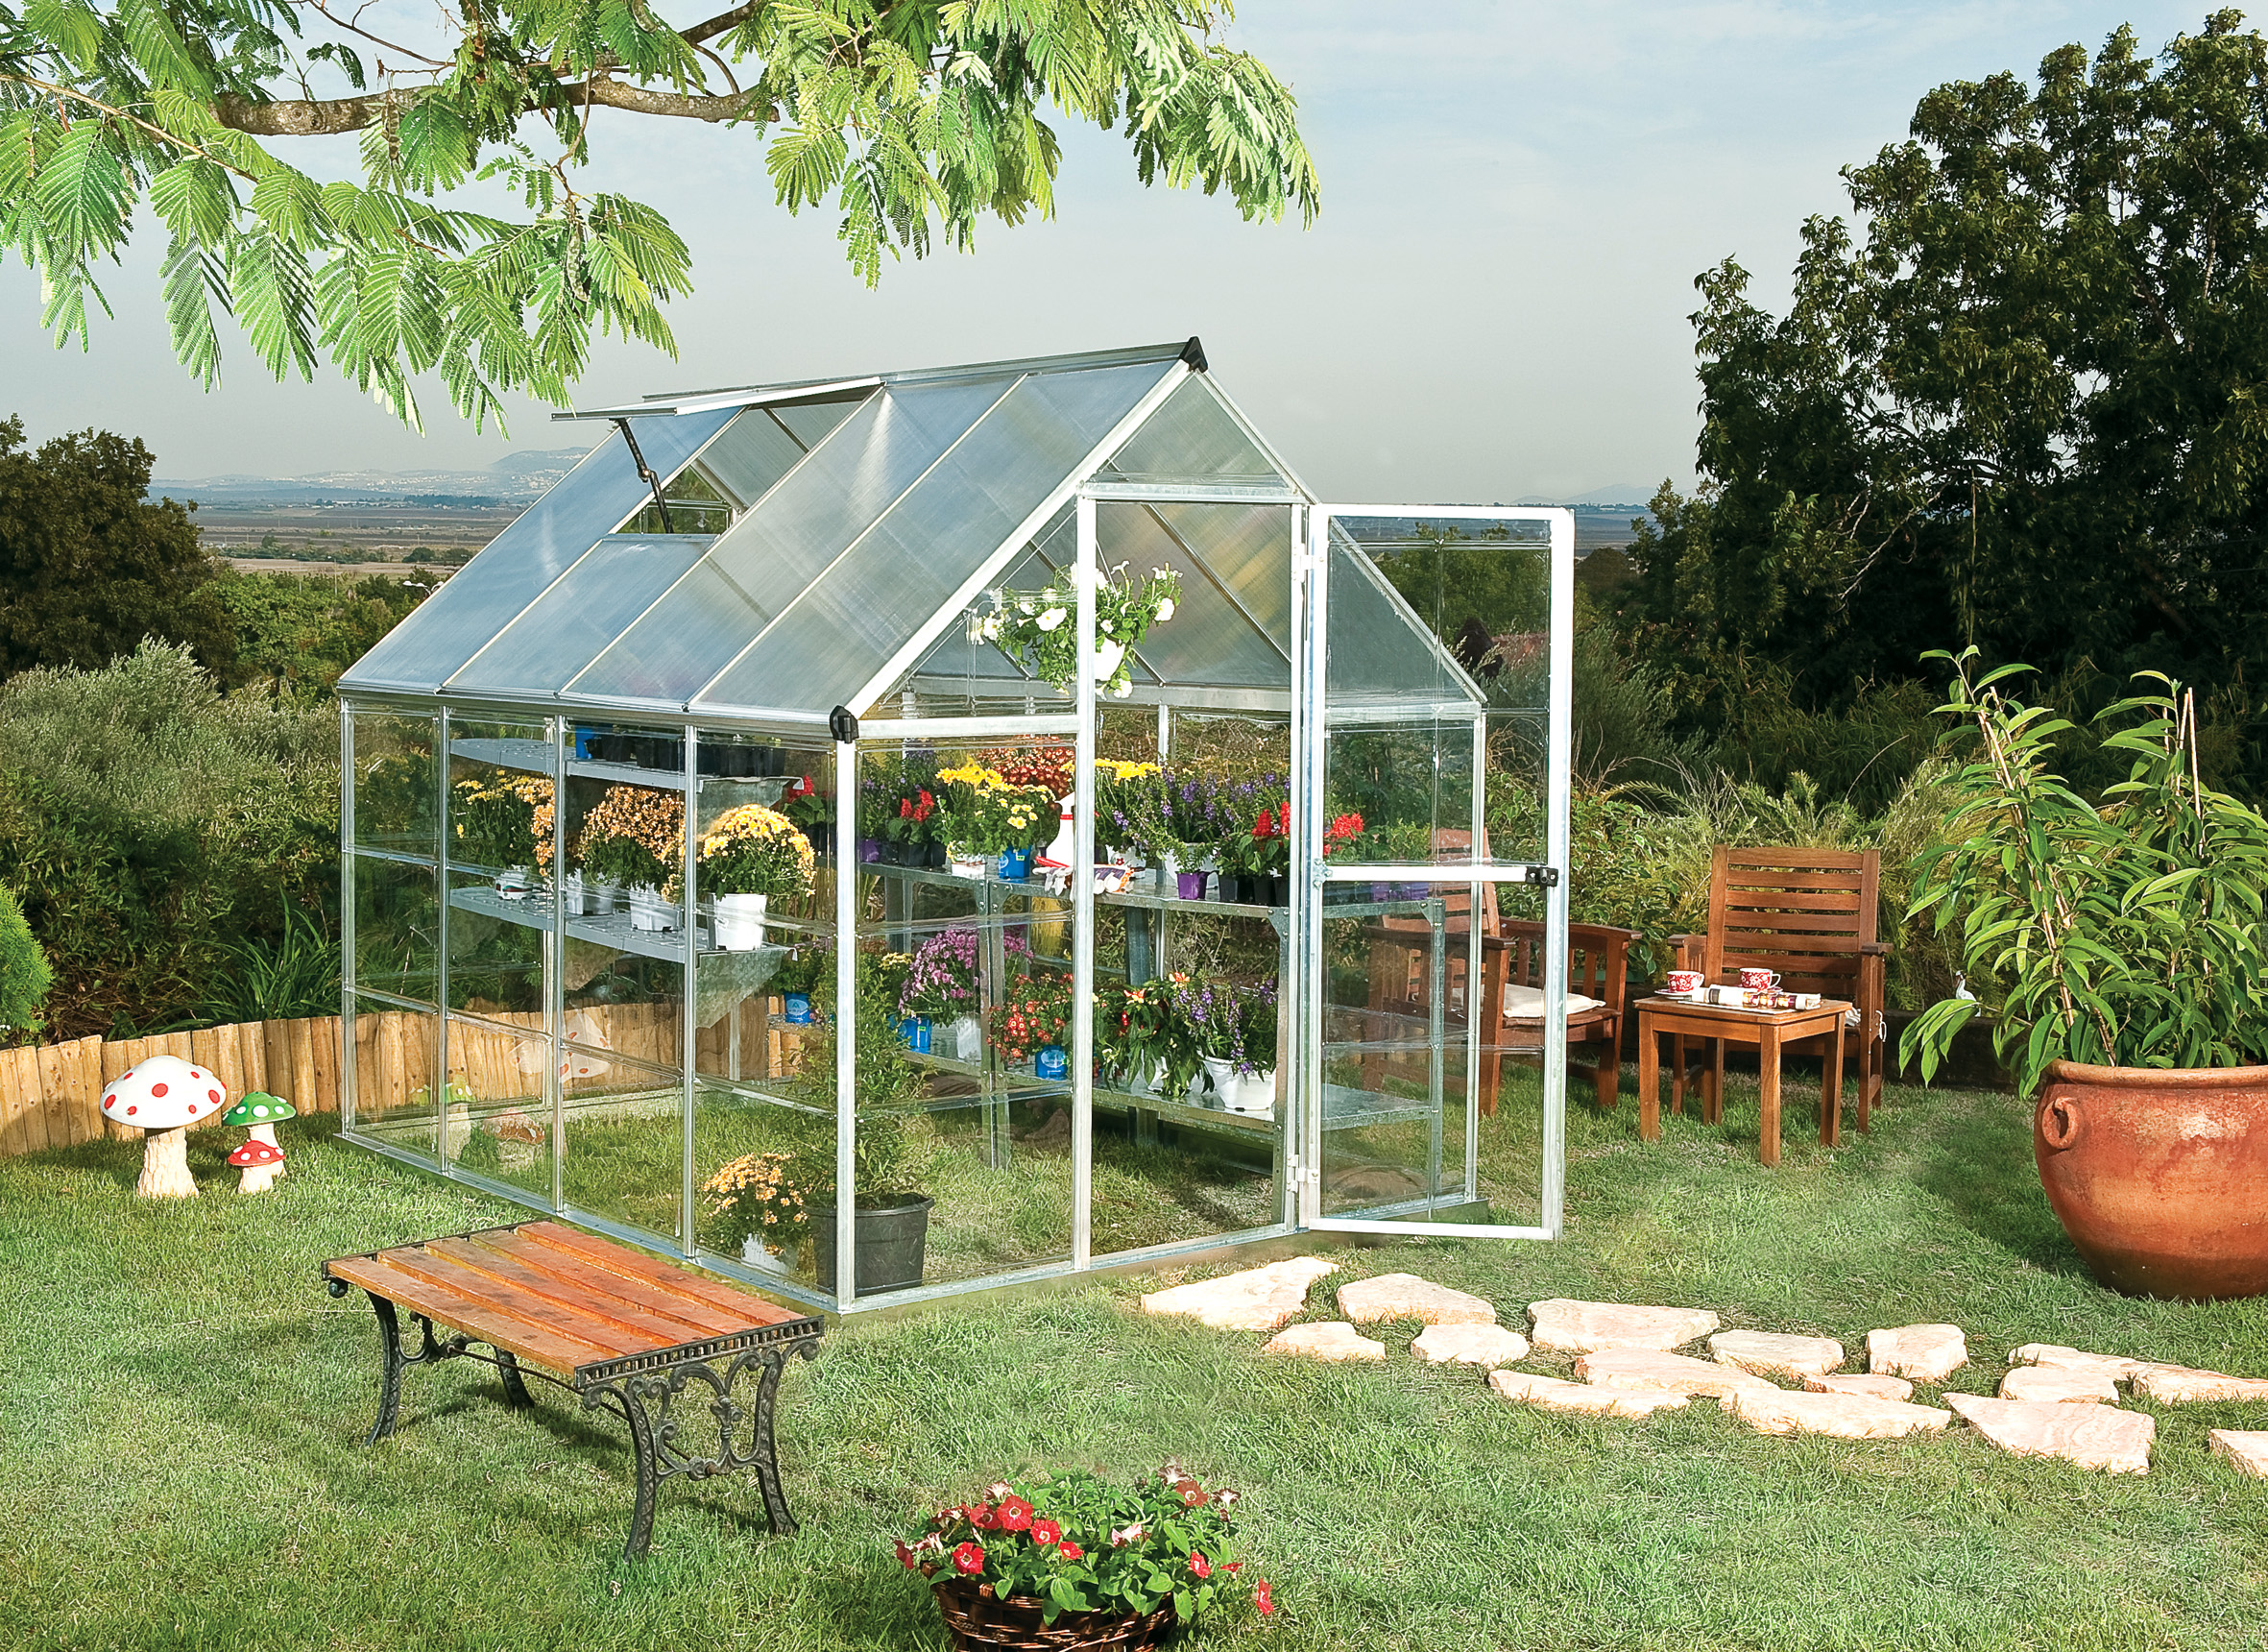 polykarbonátový skleník Palram hybrid 6x8 + ZDARMA základna skleníku + ZDARMA automatický otvírač oken + hnojivo Biocin-FF + prodloužená ZÁRUKA 10 LET